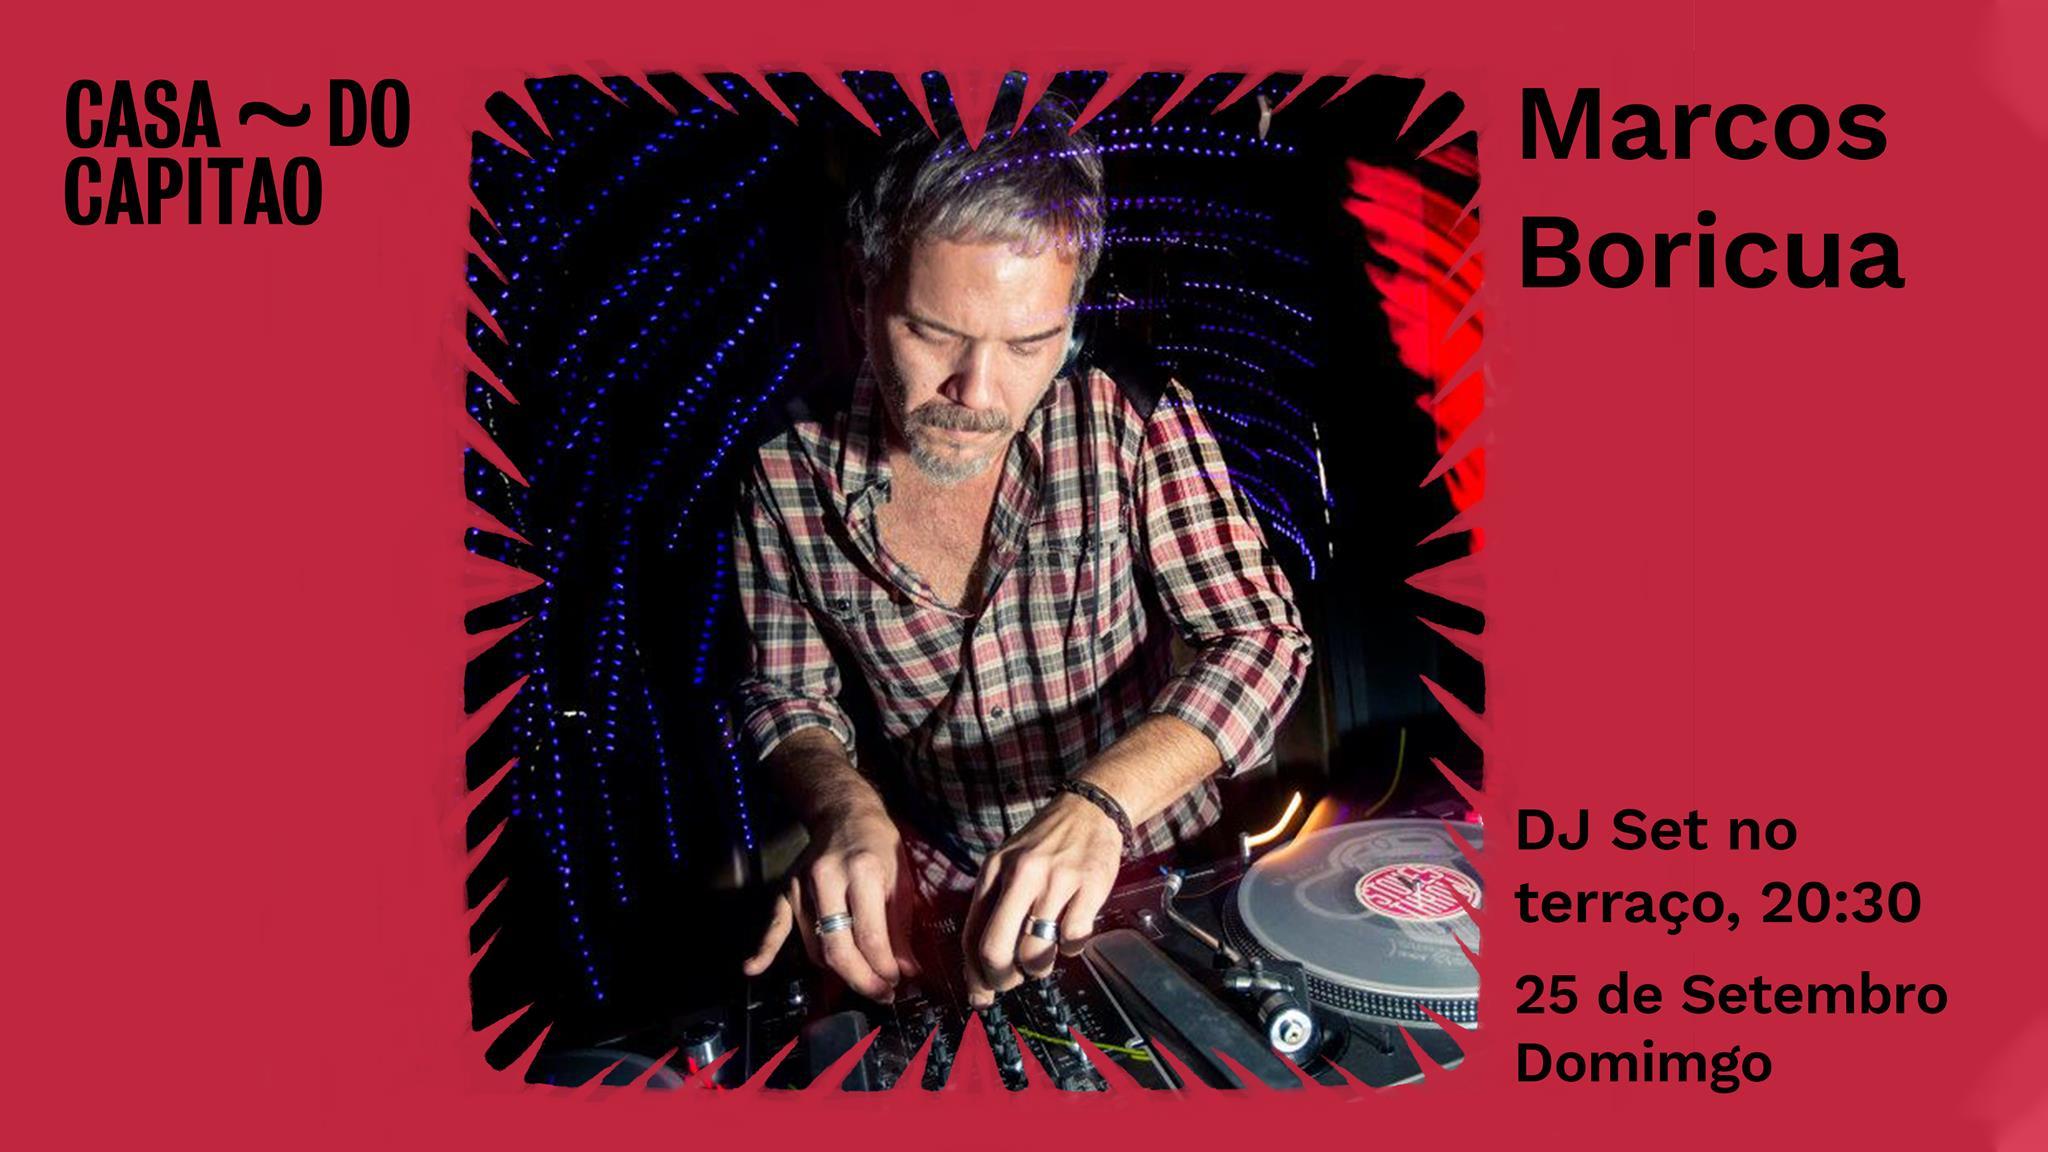 Marcos Boricua • DJ Set no terraço